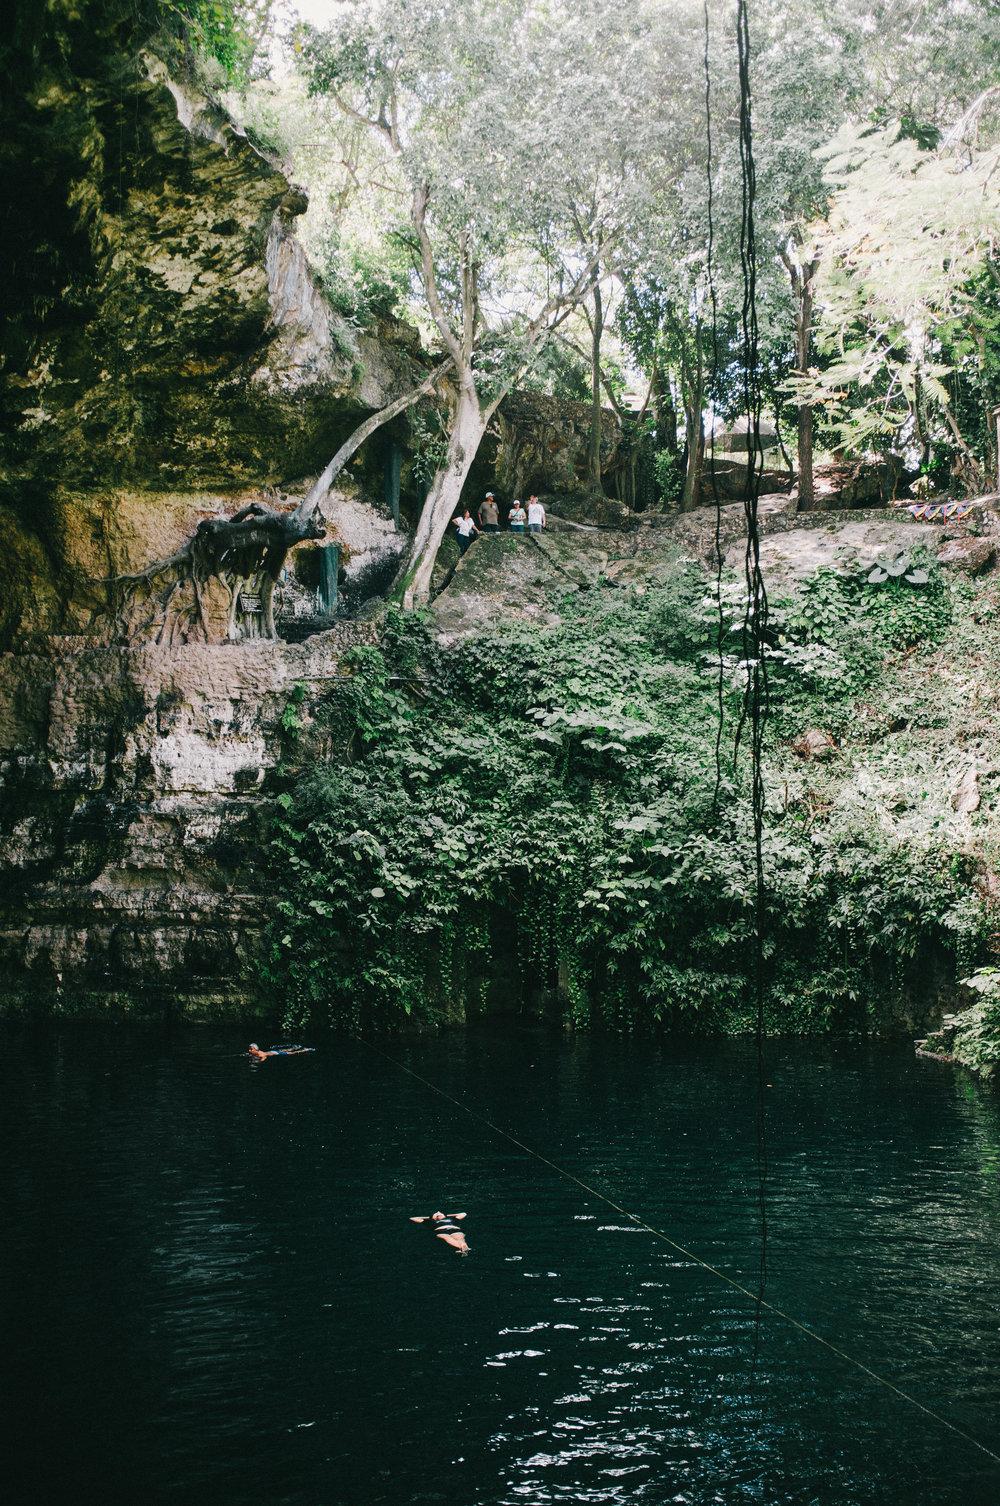 007_Anne Hollowday_Cenote Zaci_3.jpg